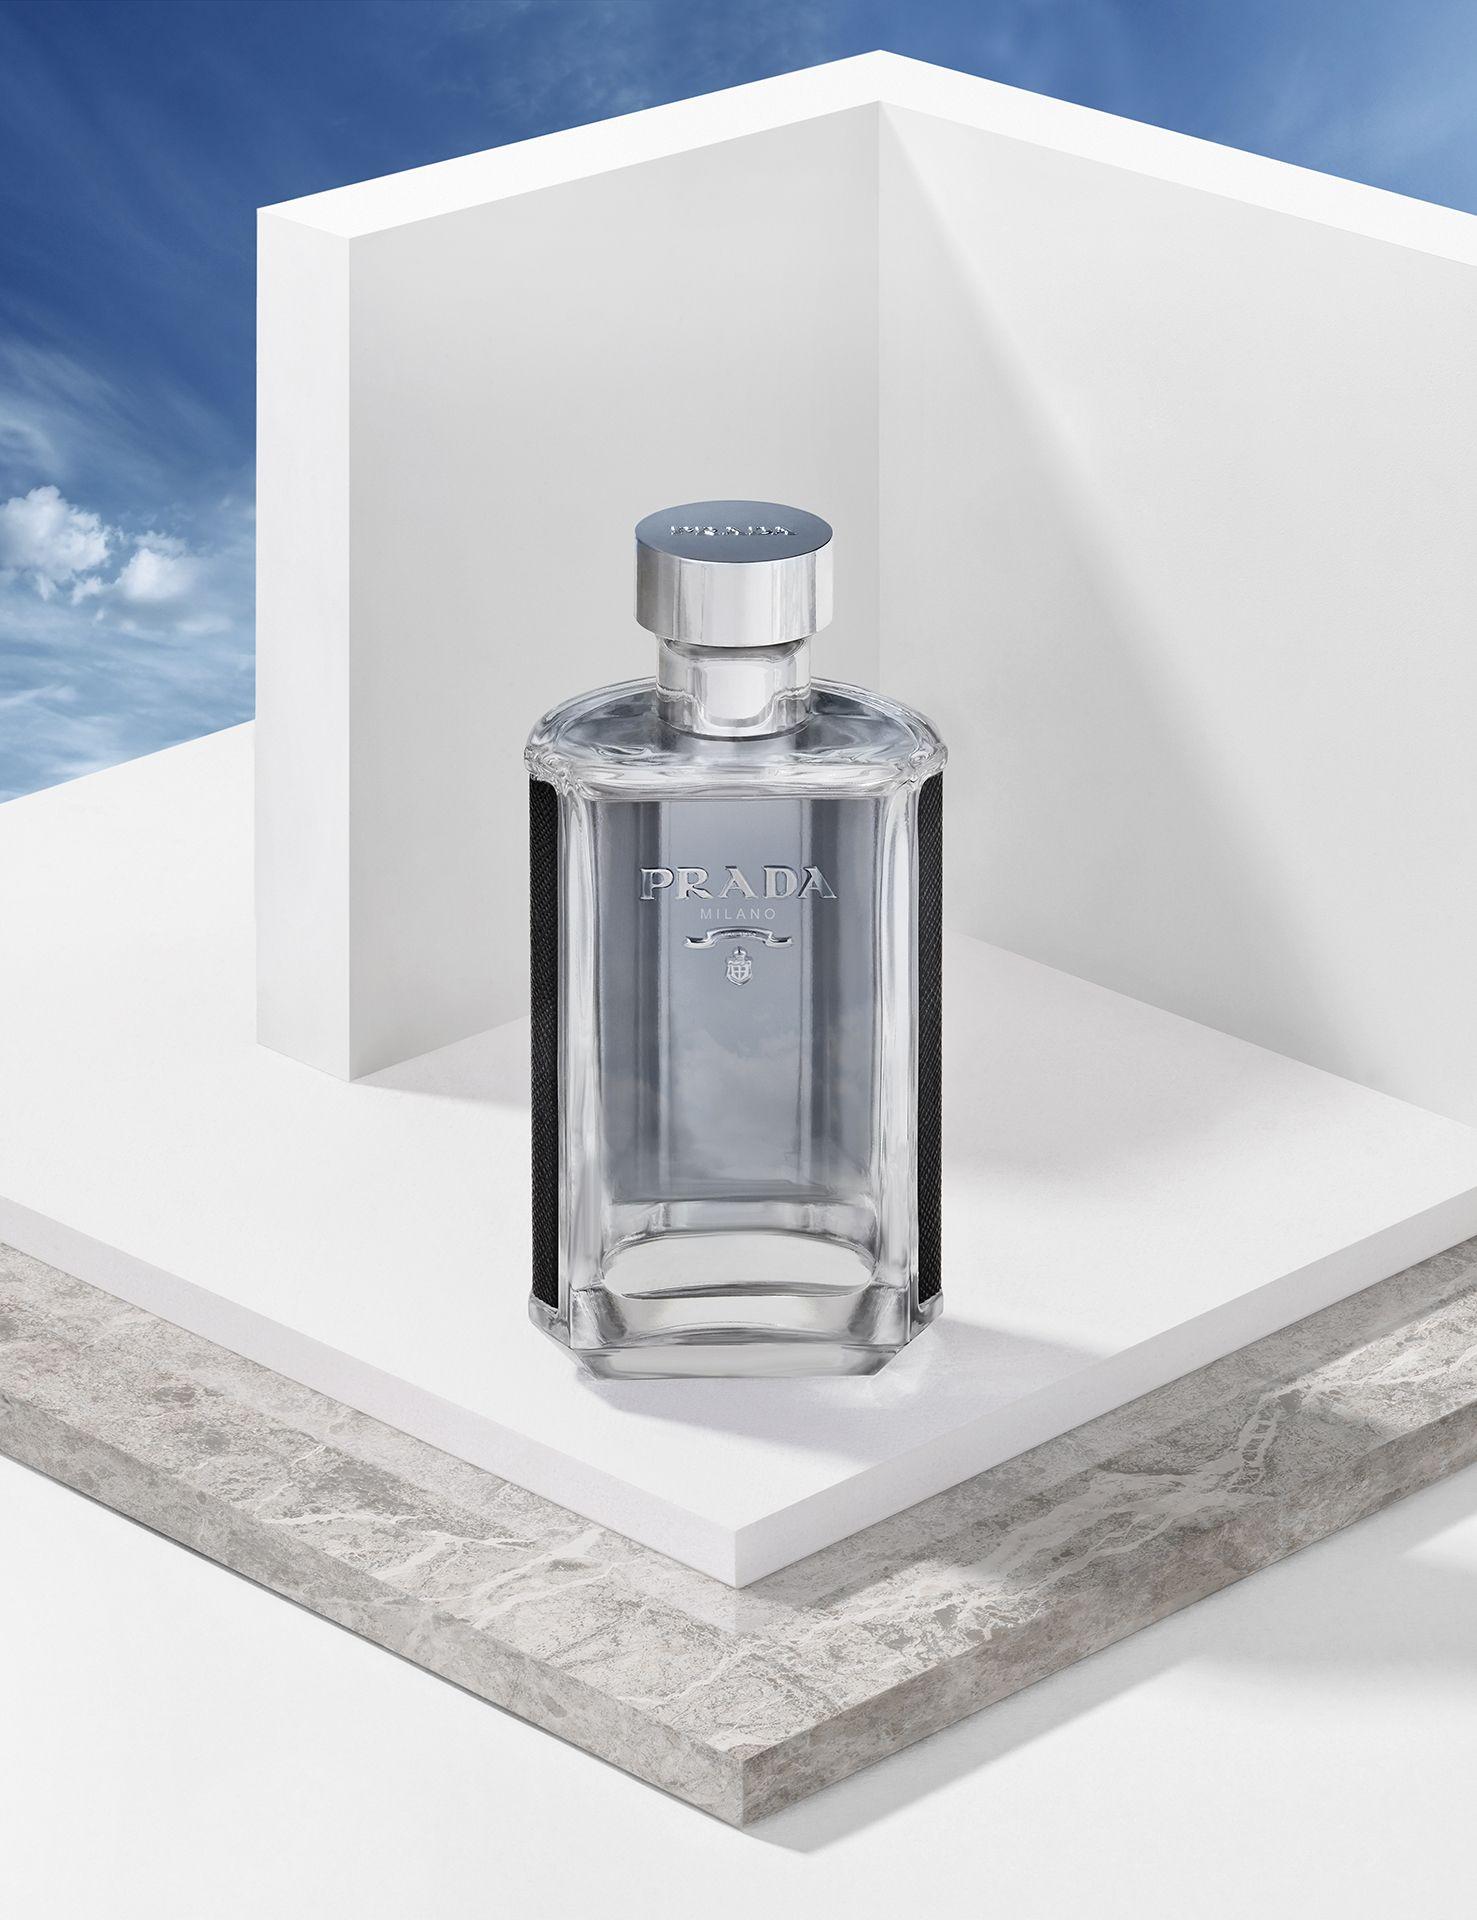 Fragrances Perfume Photographer London Creative Still Life